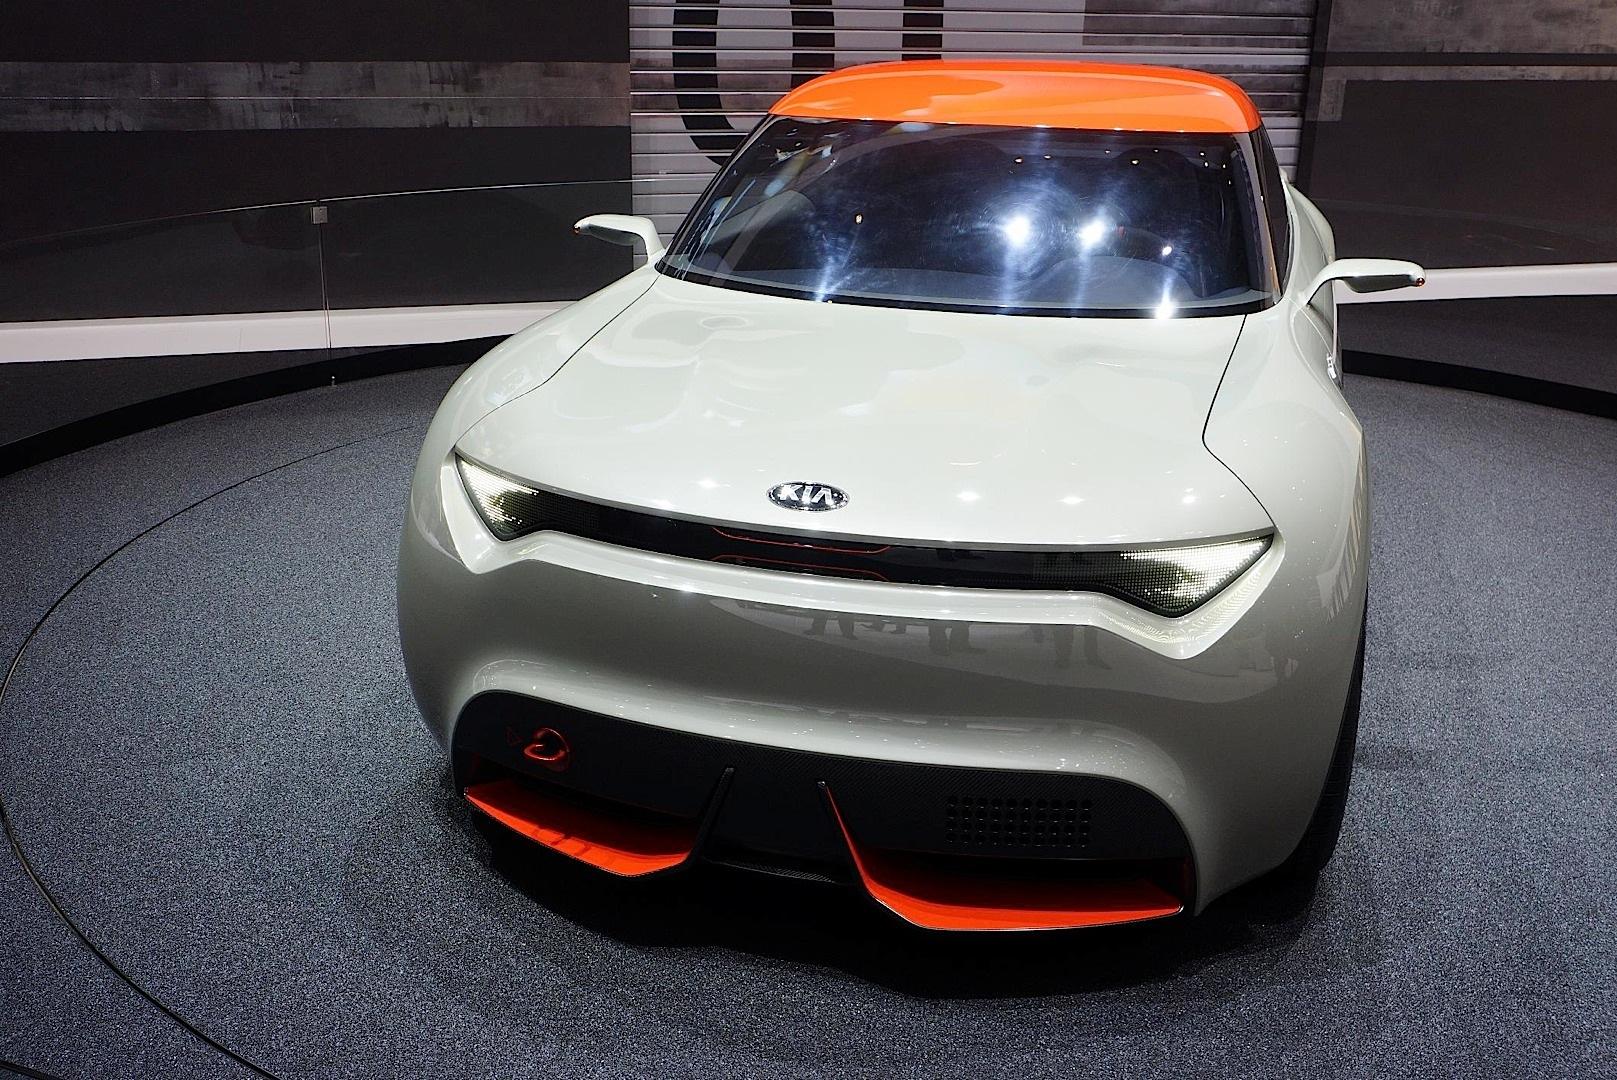 Radical Kia Provo Concept Unveiled at Geneva 2013 [Video ...